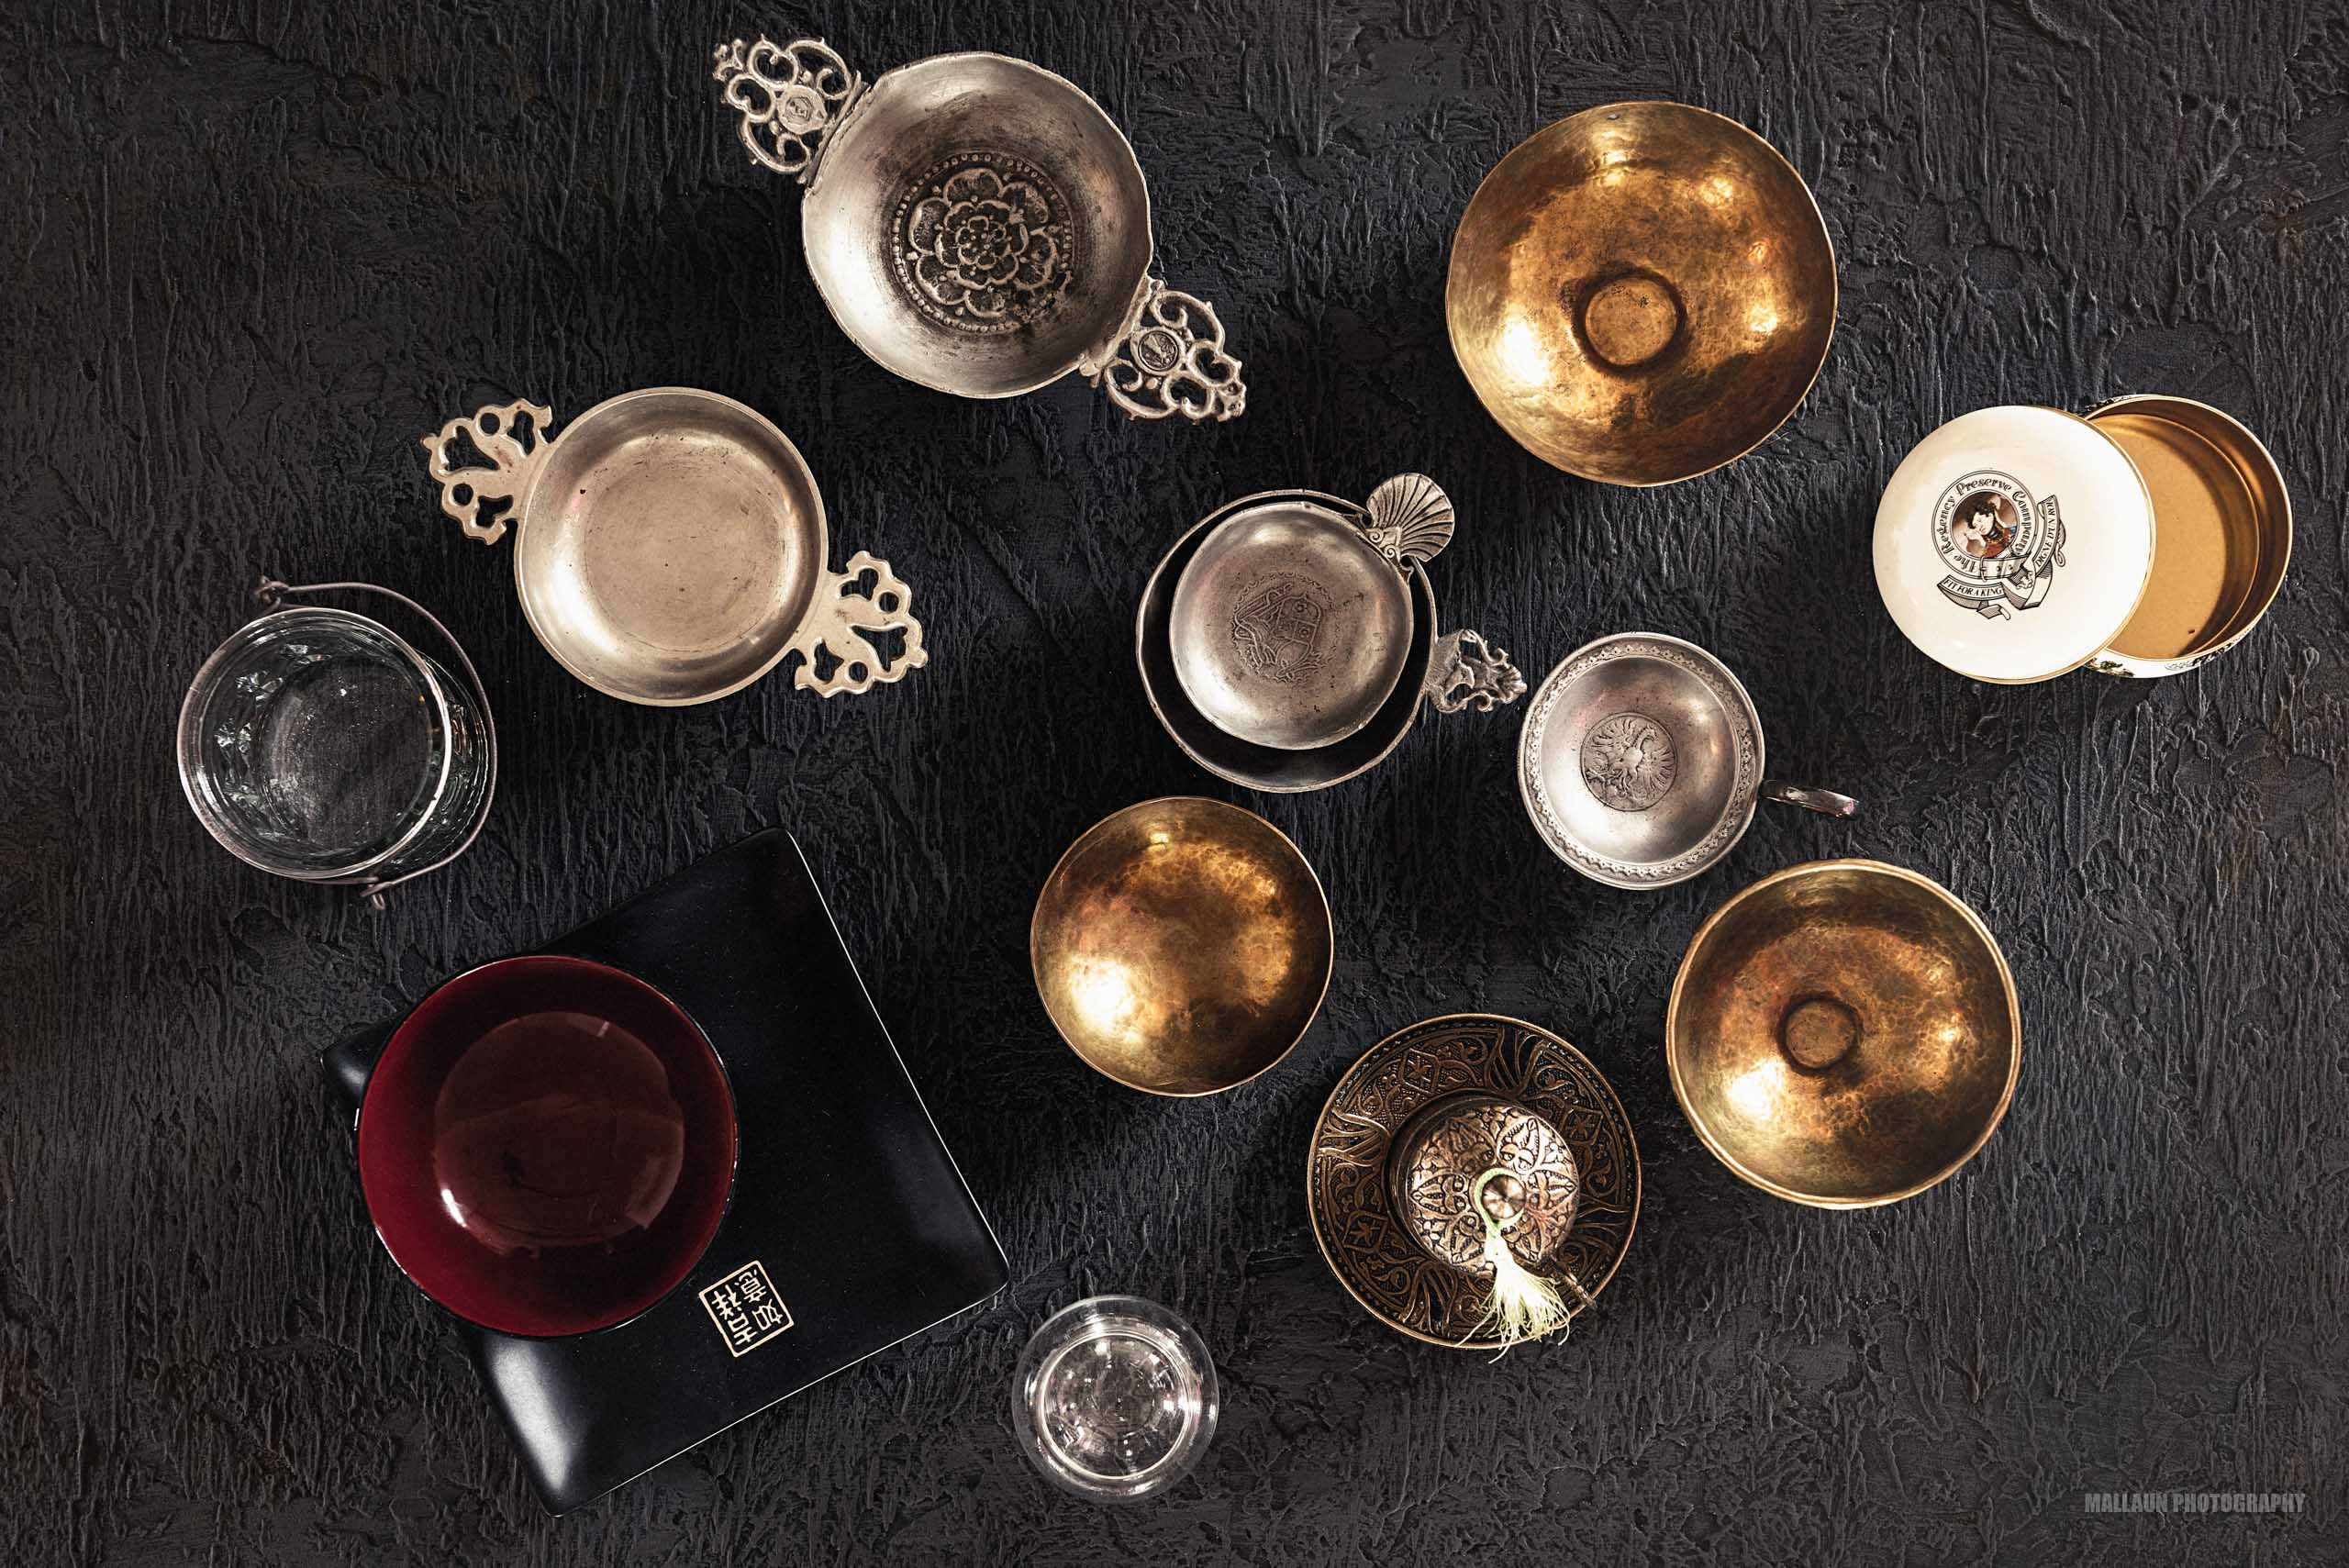 Props & Accessoires (Schalen) Teller for Food Photography